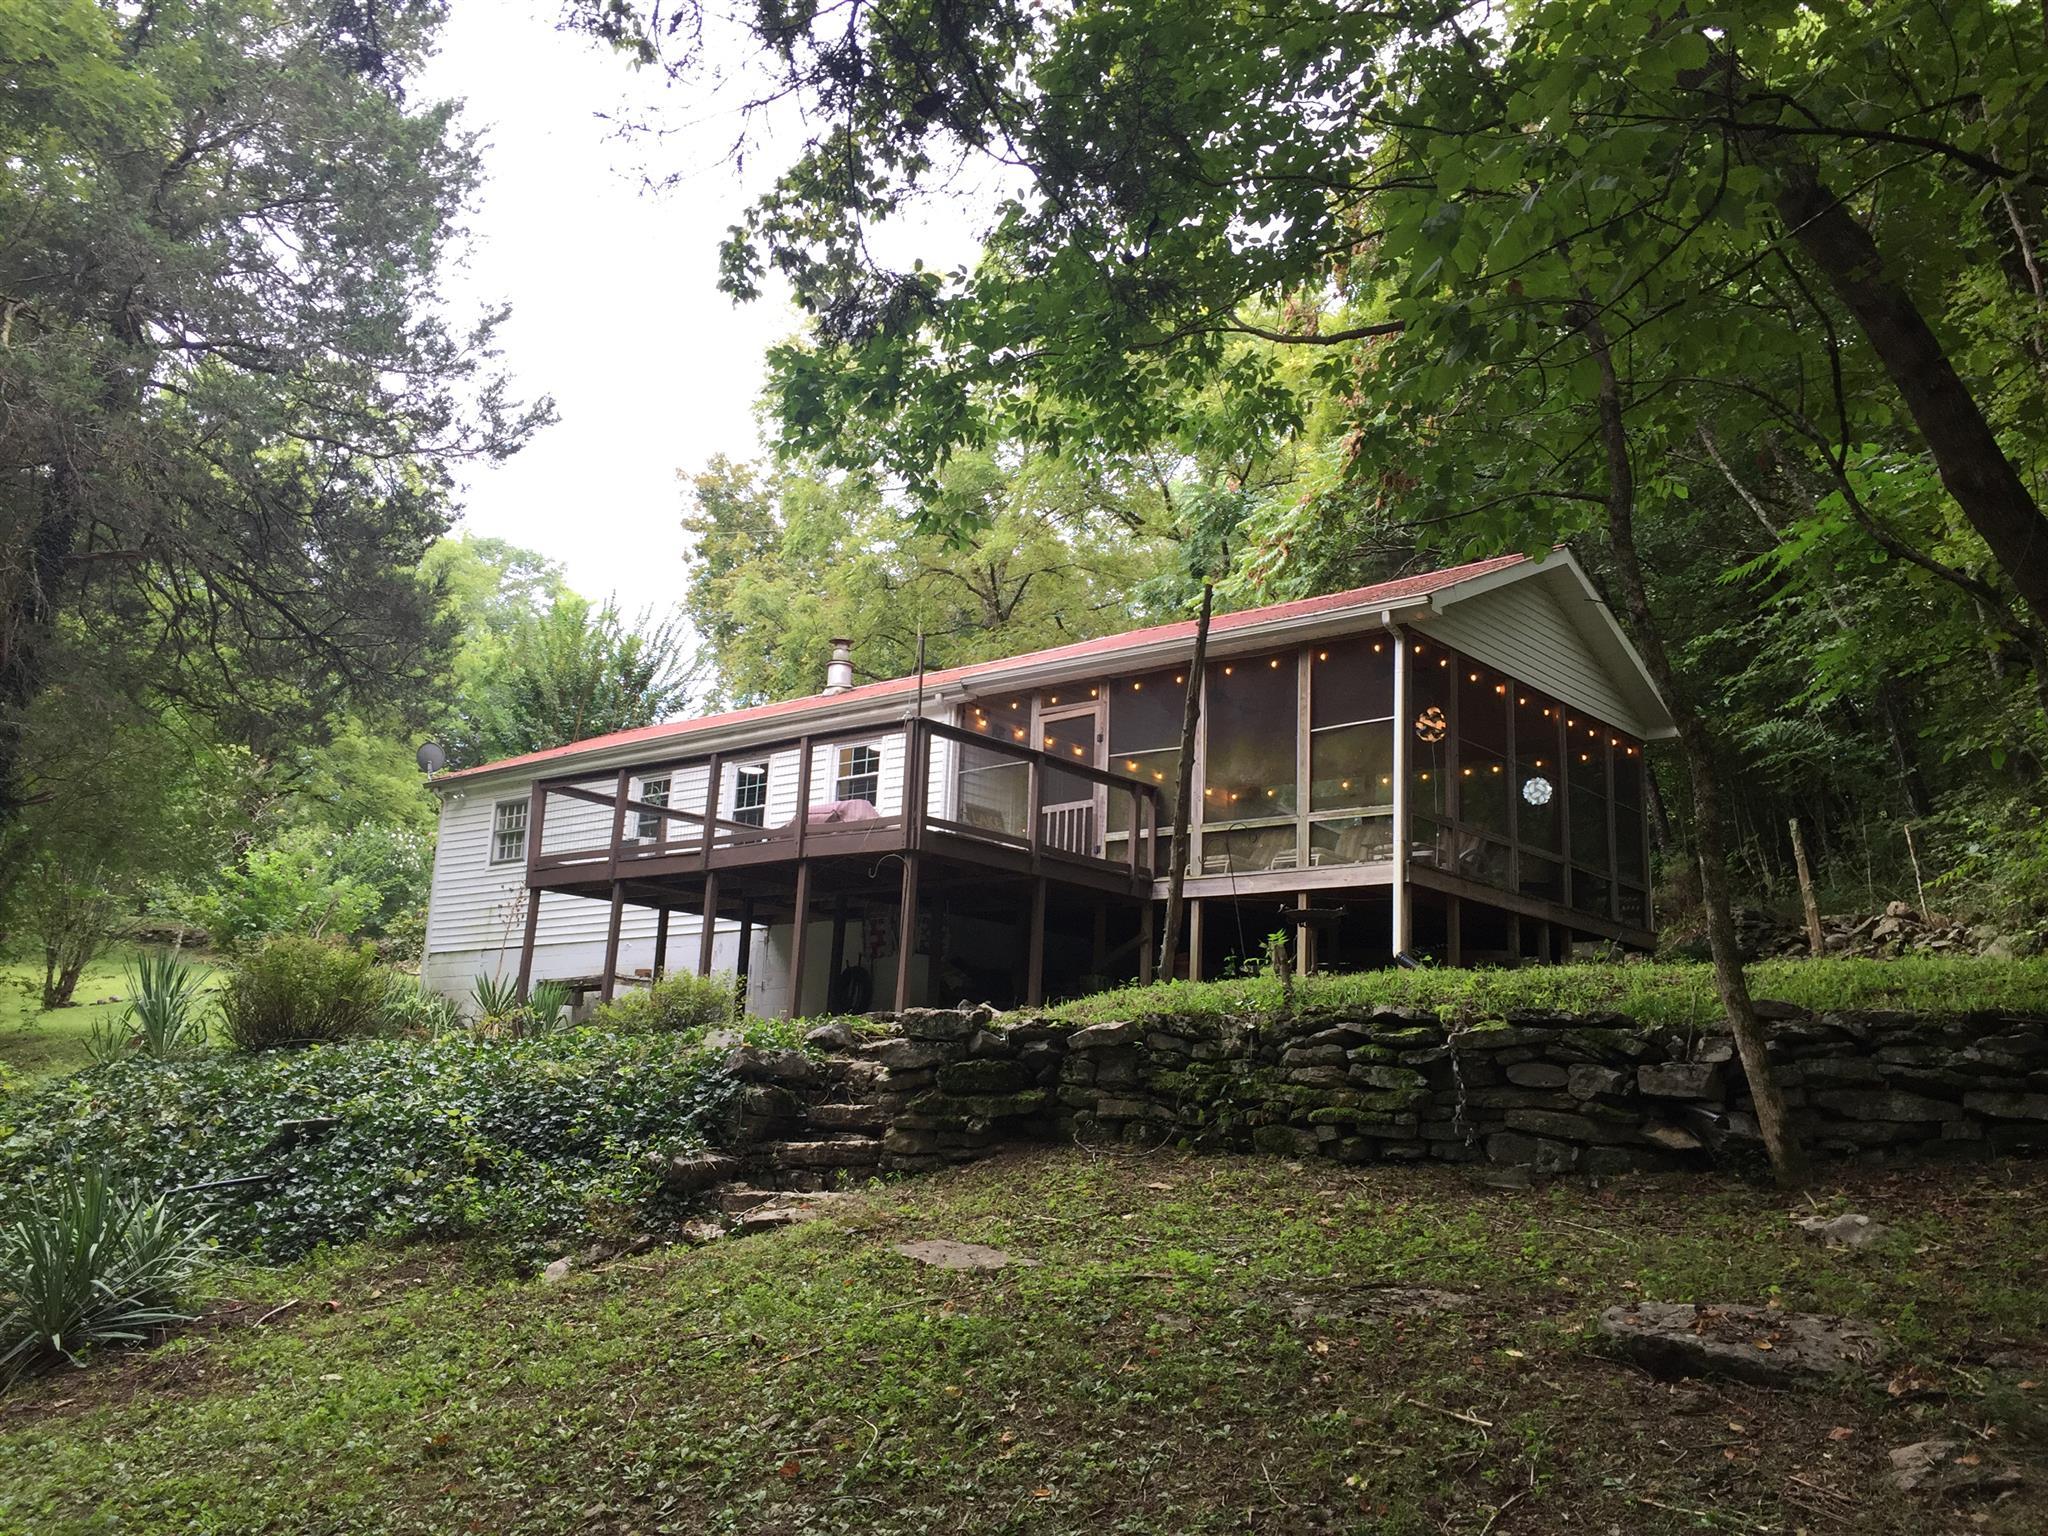 6446 Coconut Ridge Rd, Smithville, TN 37166 - Smithville, TN real estate listing